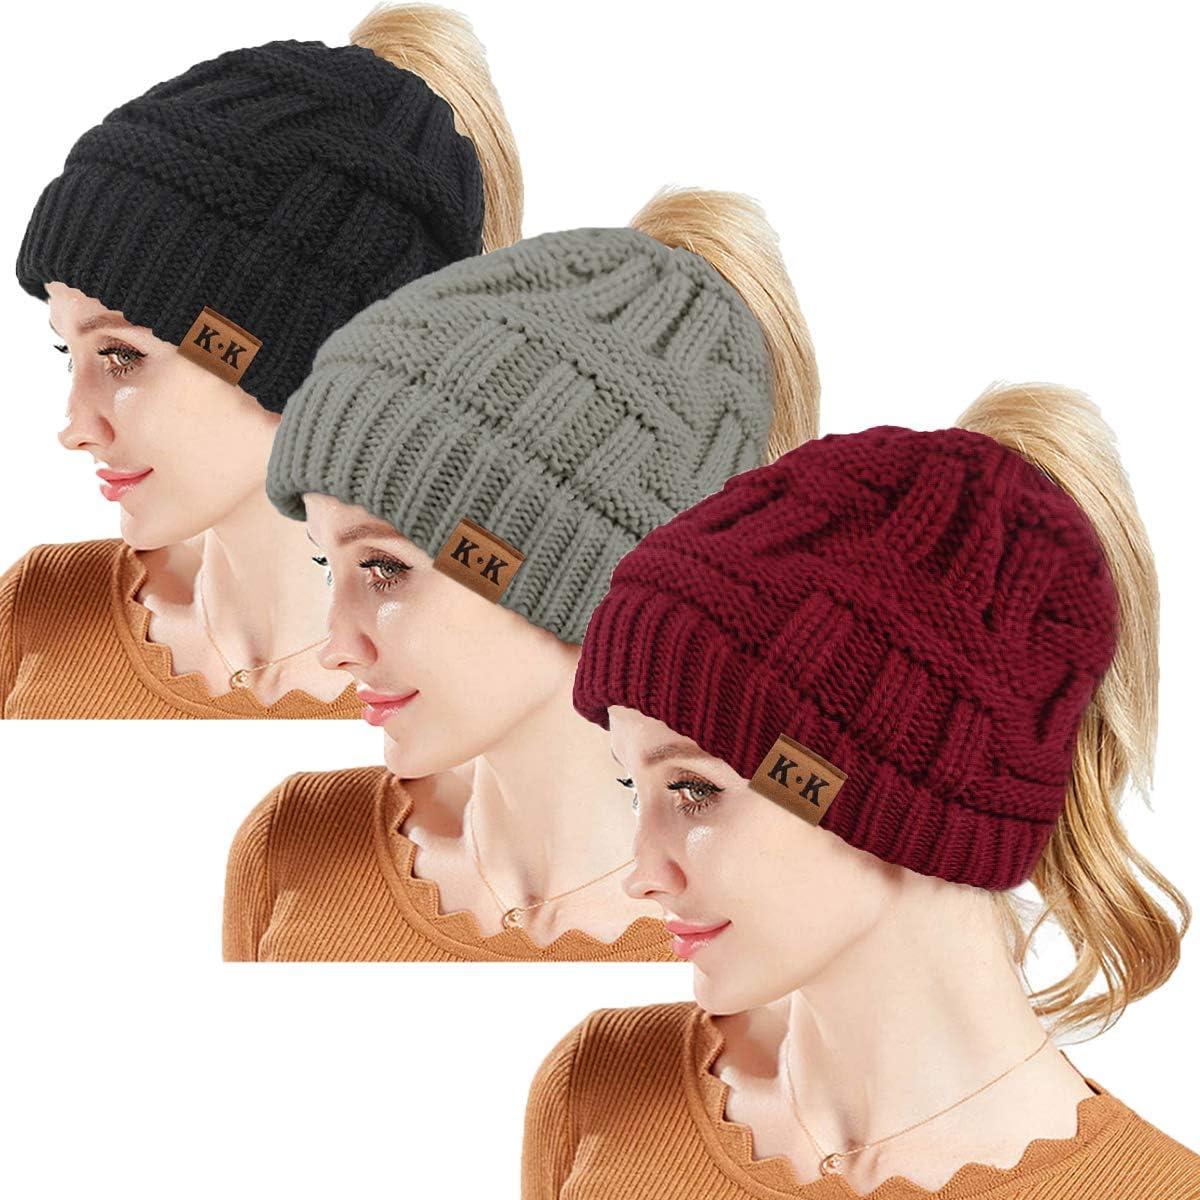 Ponytail Beanie Hat - Women Knit Winter Hat Stretch Ponytail Beanie Hat Messy Bun BeanieTail Cable Knit Slouchy Warm Hat